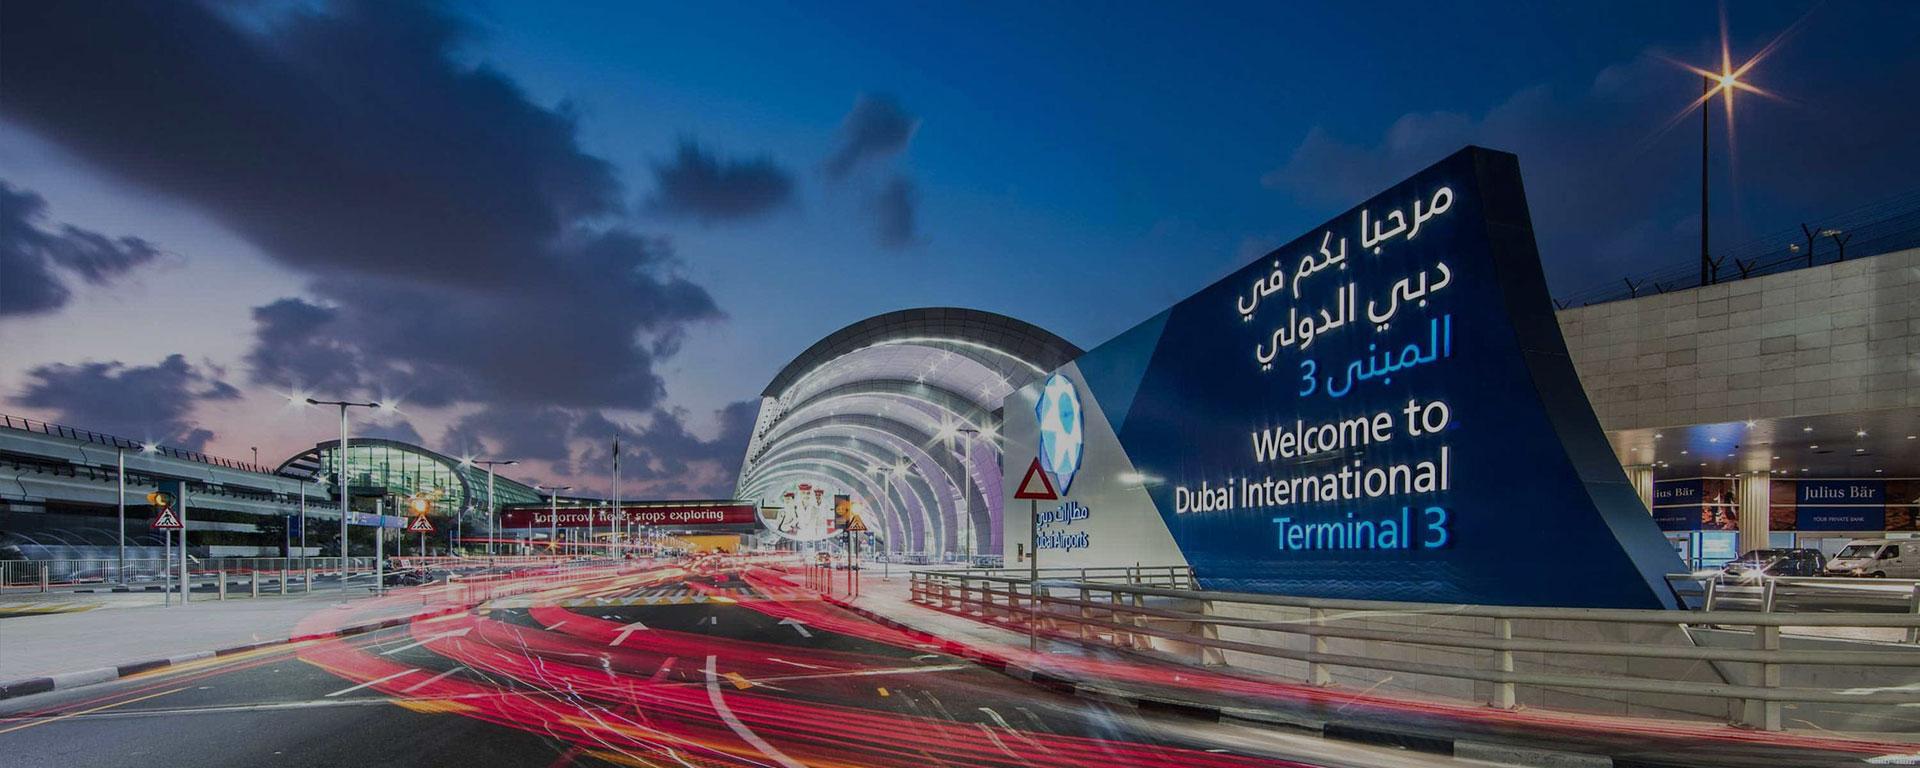 Dubai Airport Taxi Screens -